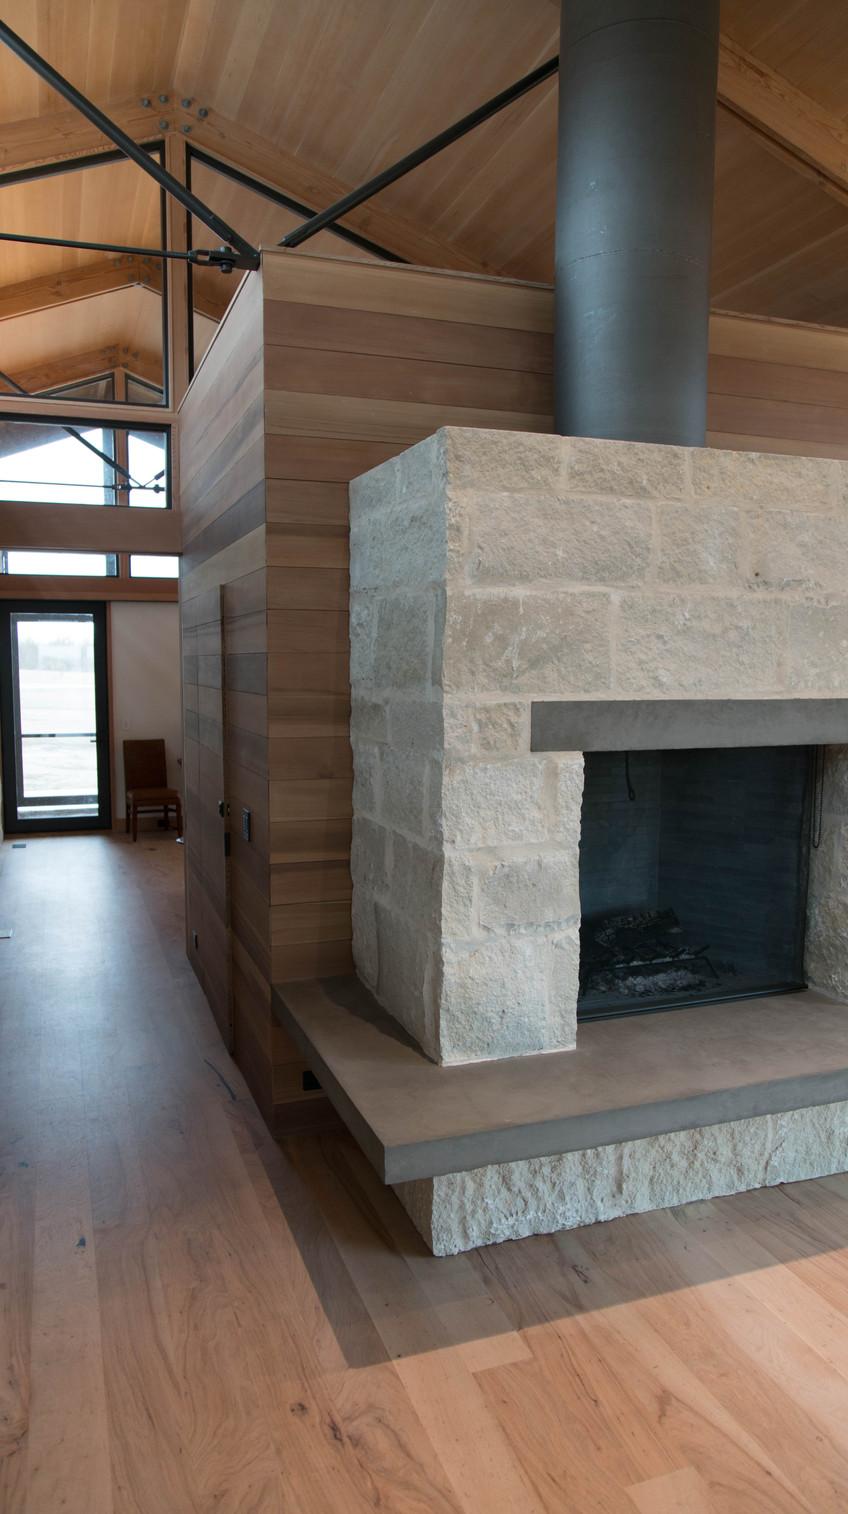 hardwood-design-company-2019-hardwood-flooring-trends-wide-plank-hardwood-flooring-southern-pecan-hardwood-flooring-matte-finish-hardwood-floors